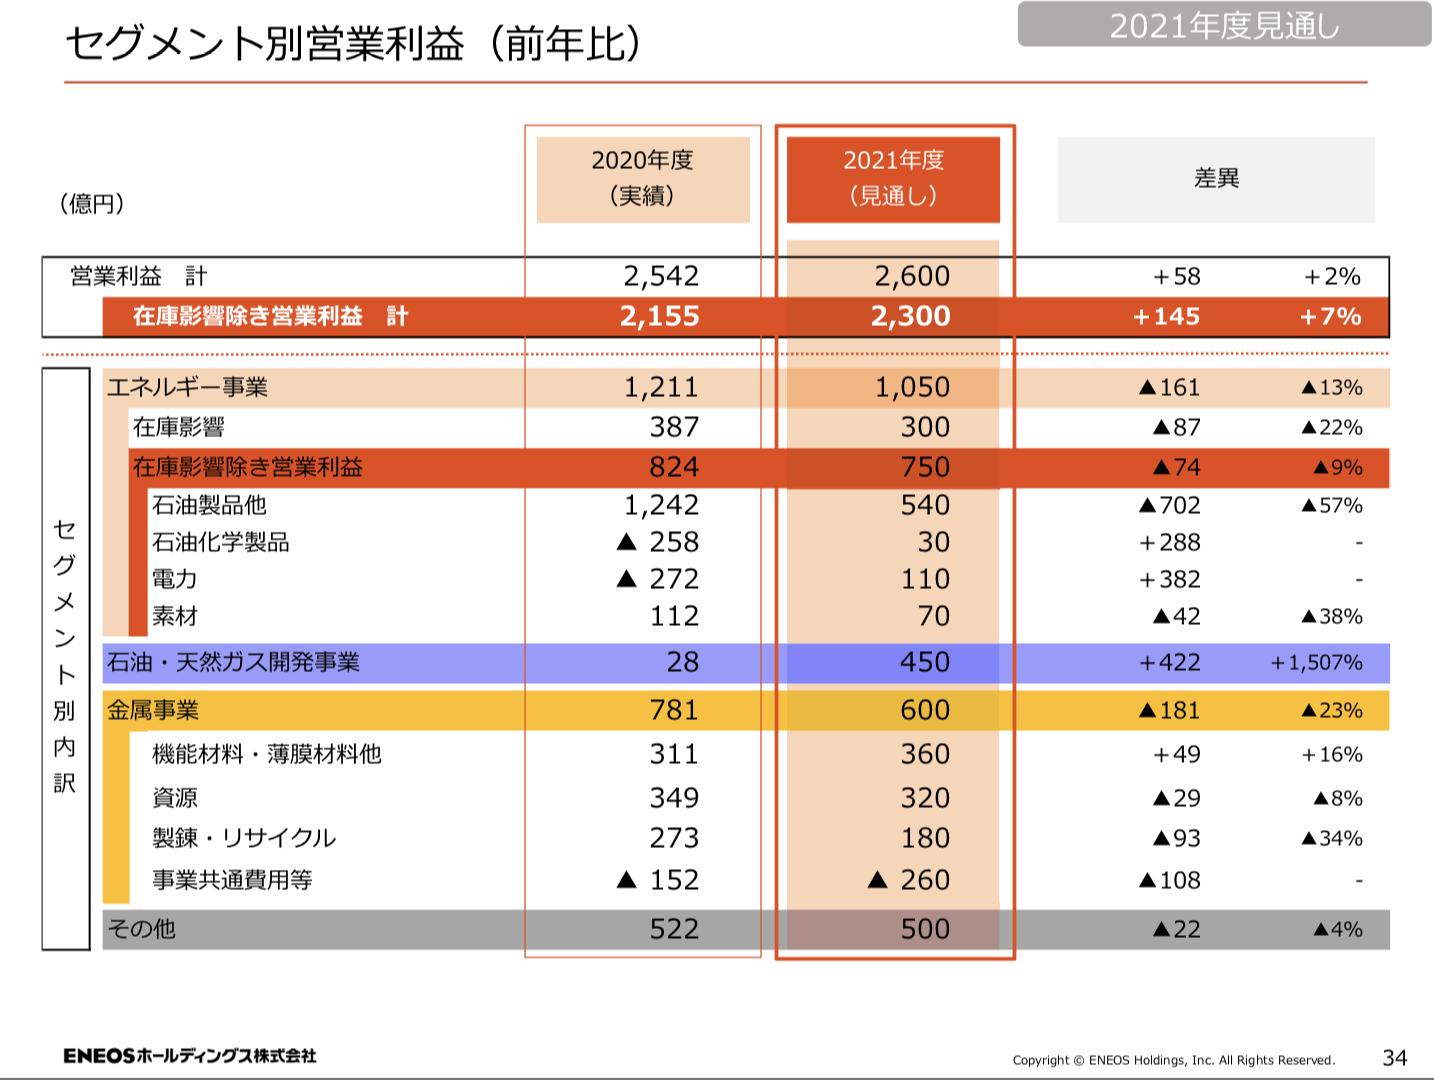 ENEOSホールディングス株式会社 2020年度 決算説明資料